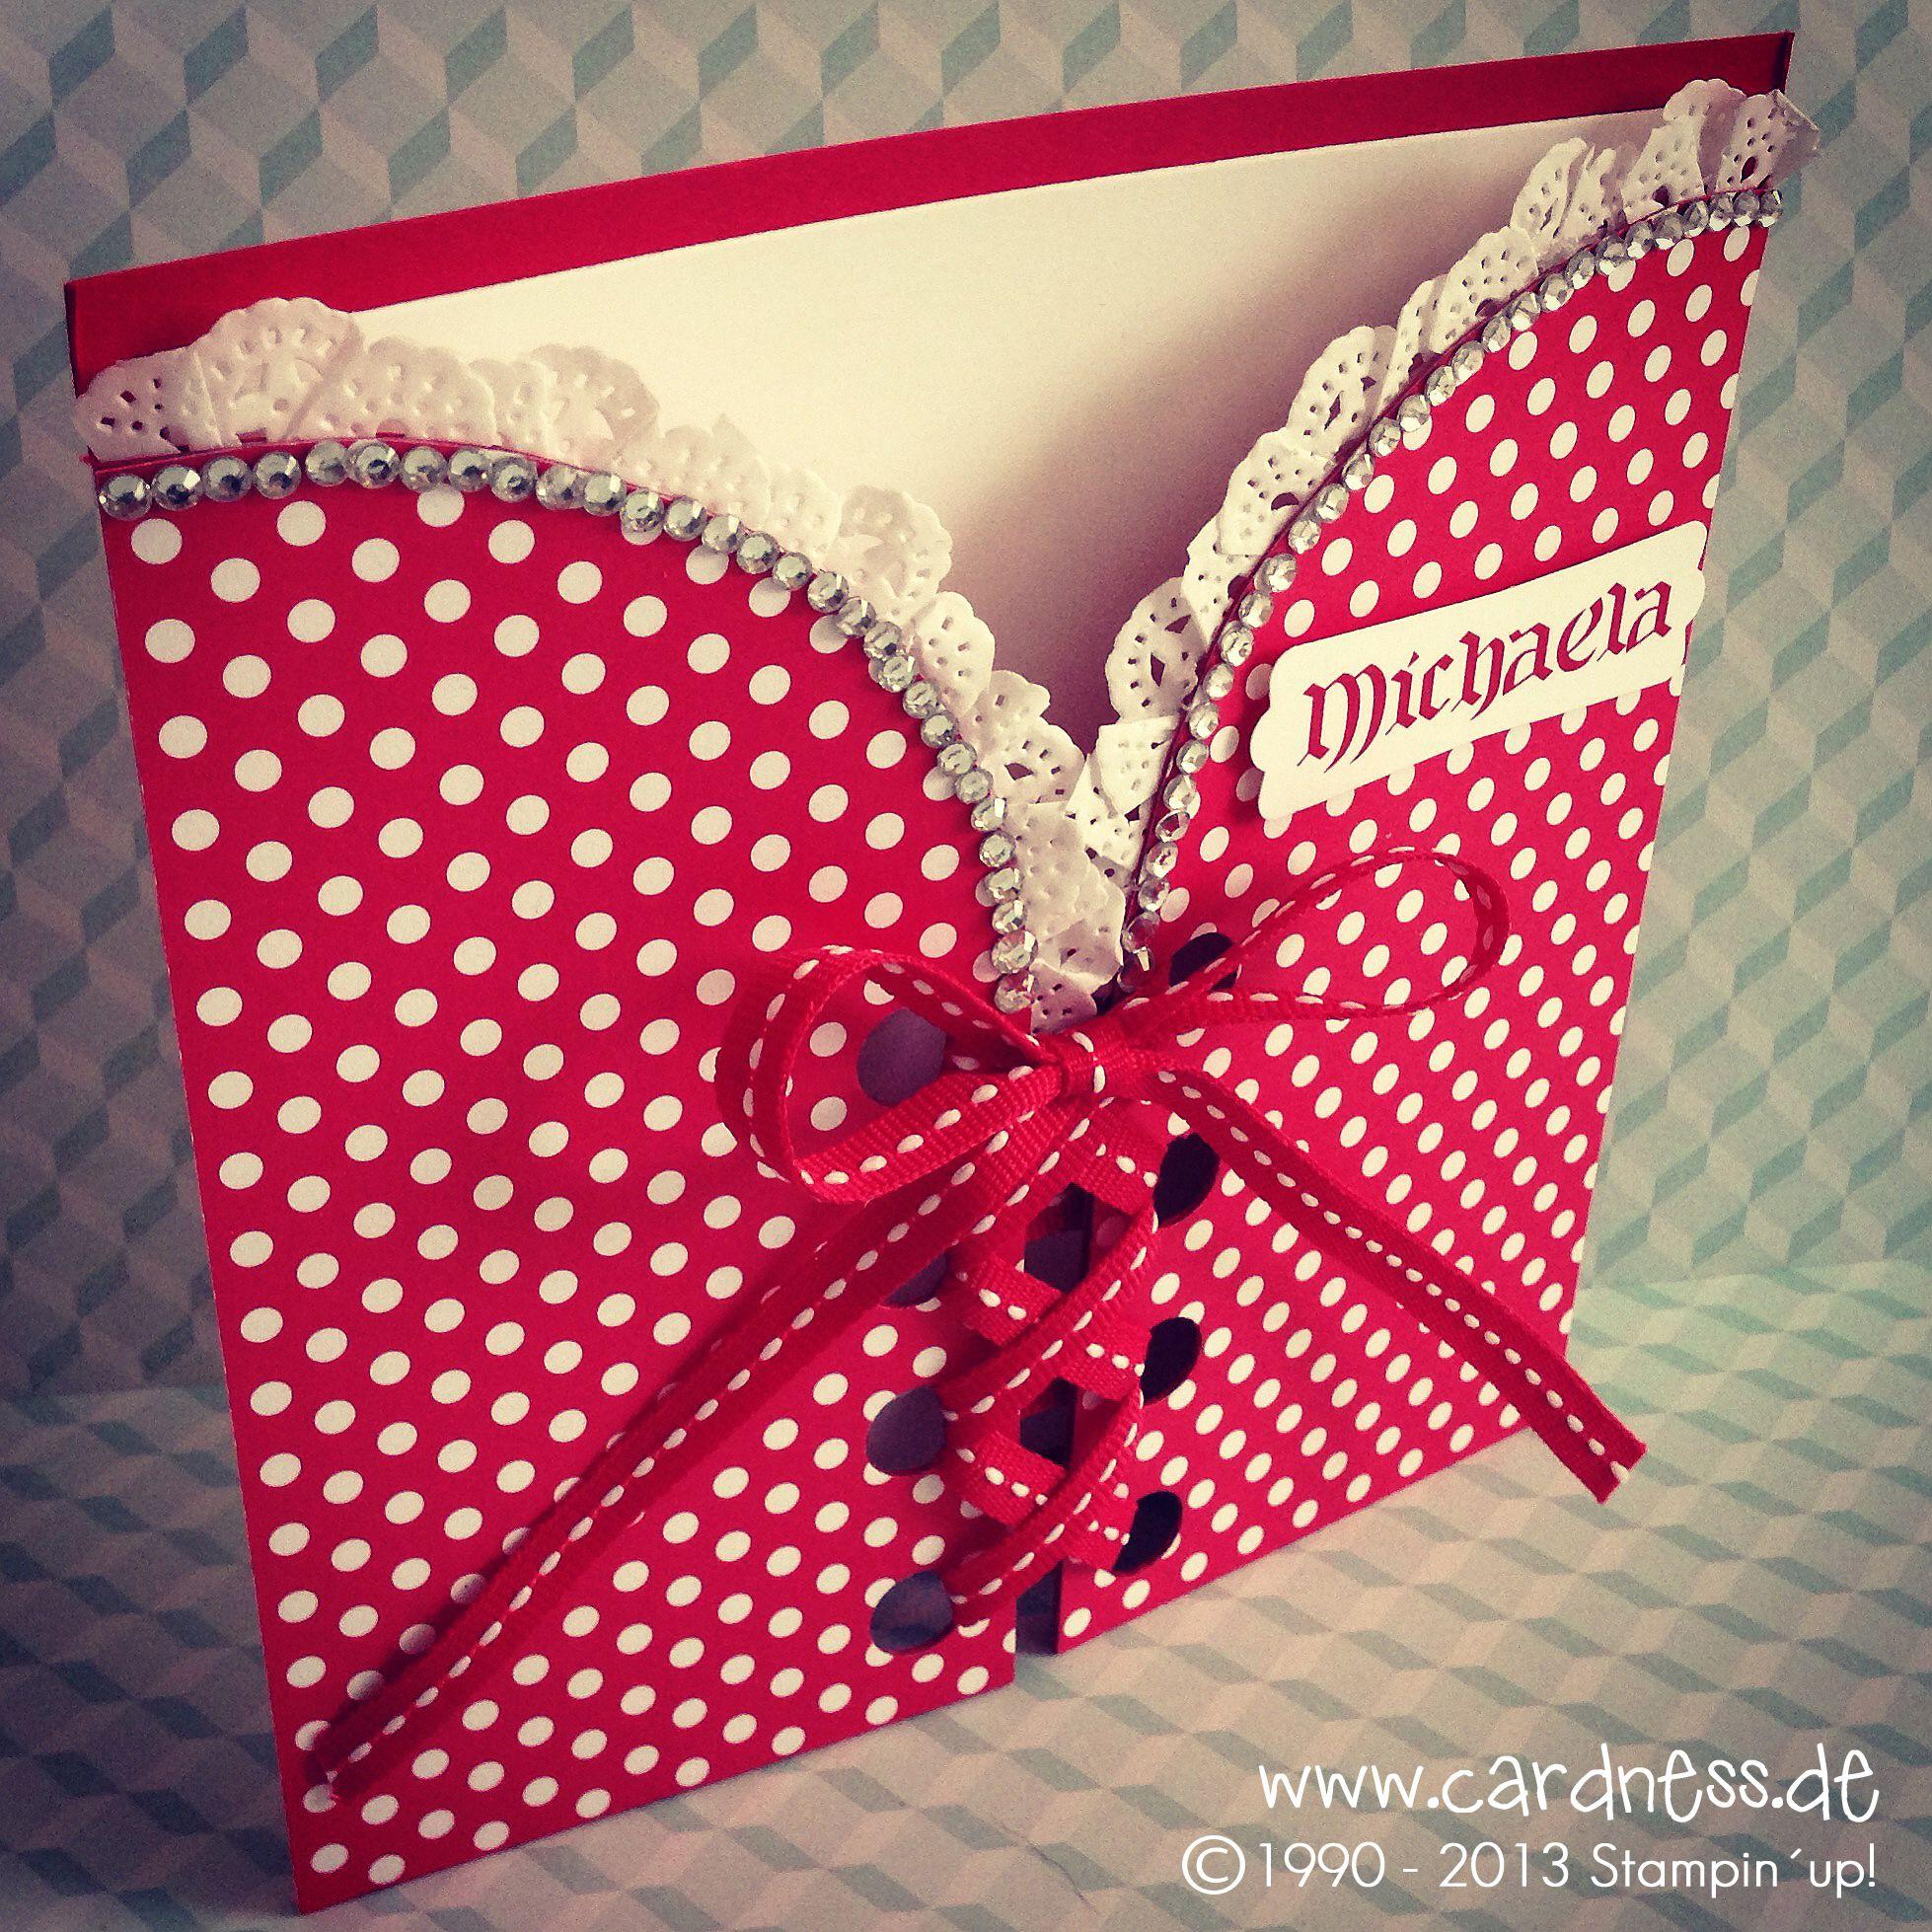 Geburtstagskarte Basteln Frau.Geburtstagskarte Dirndl Cards Karten Basteln